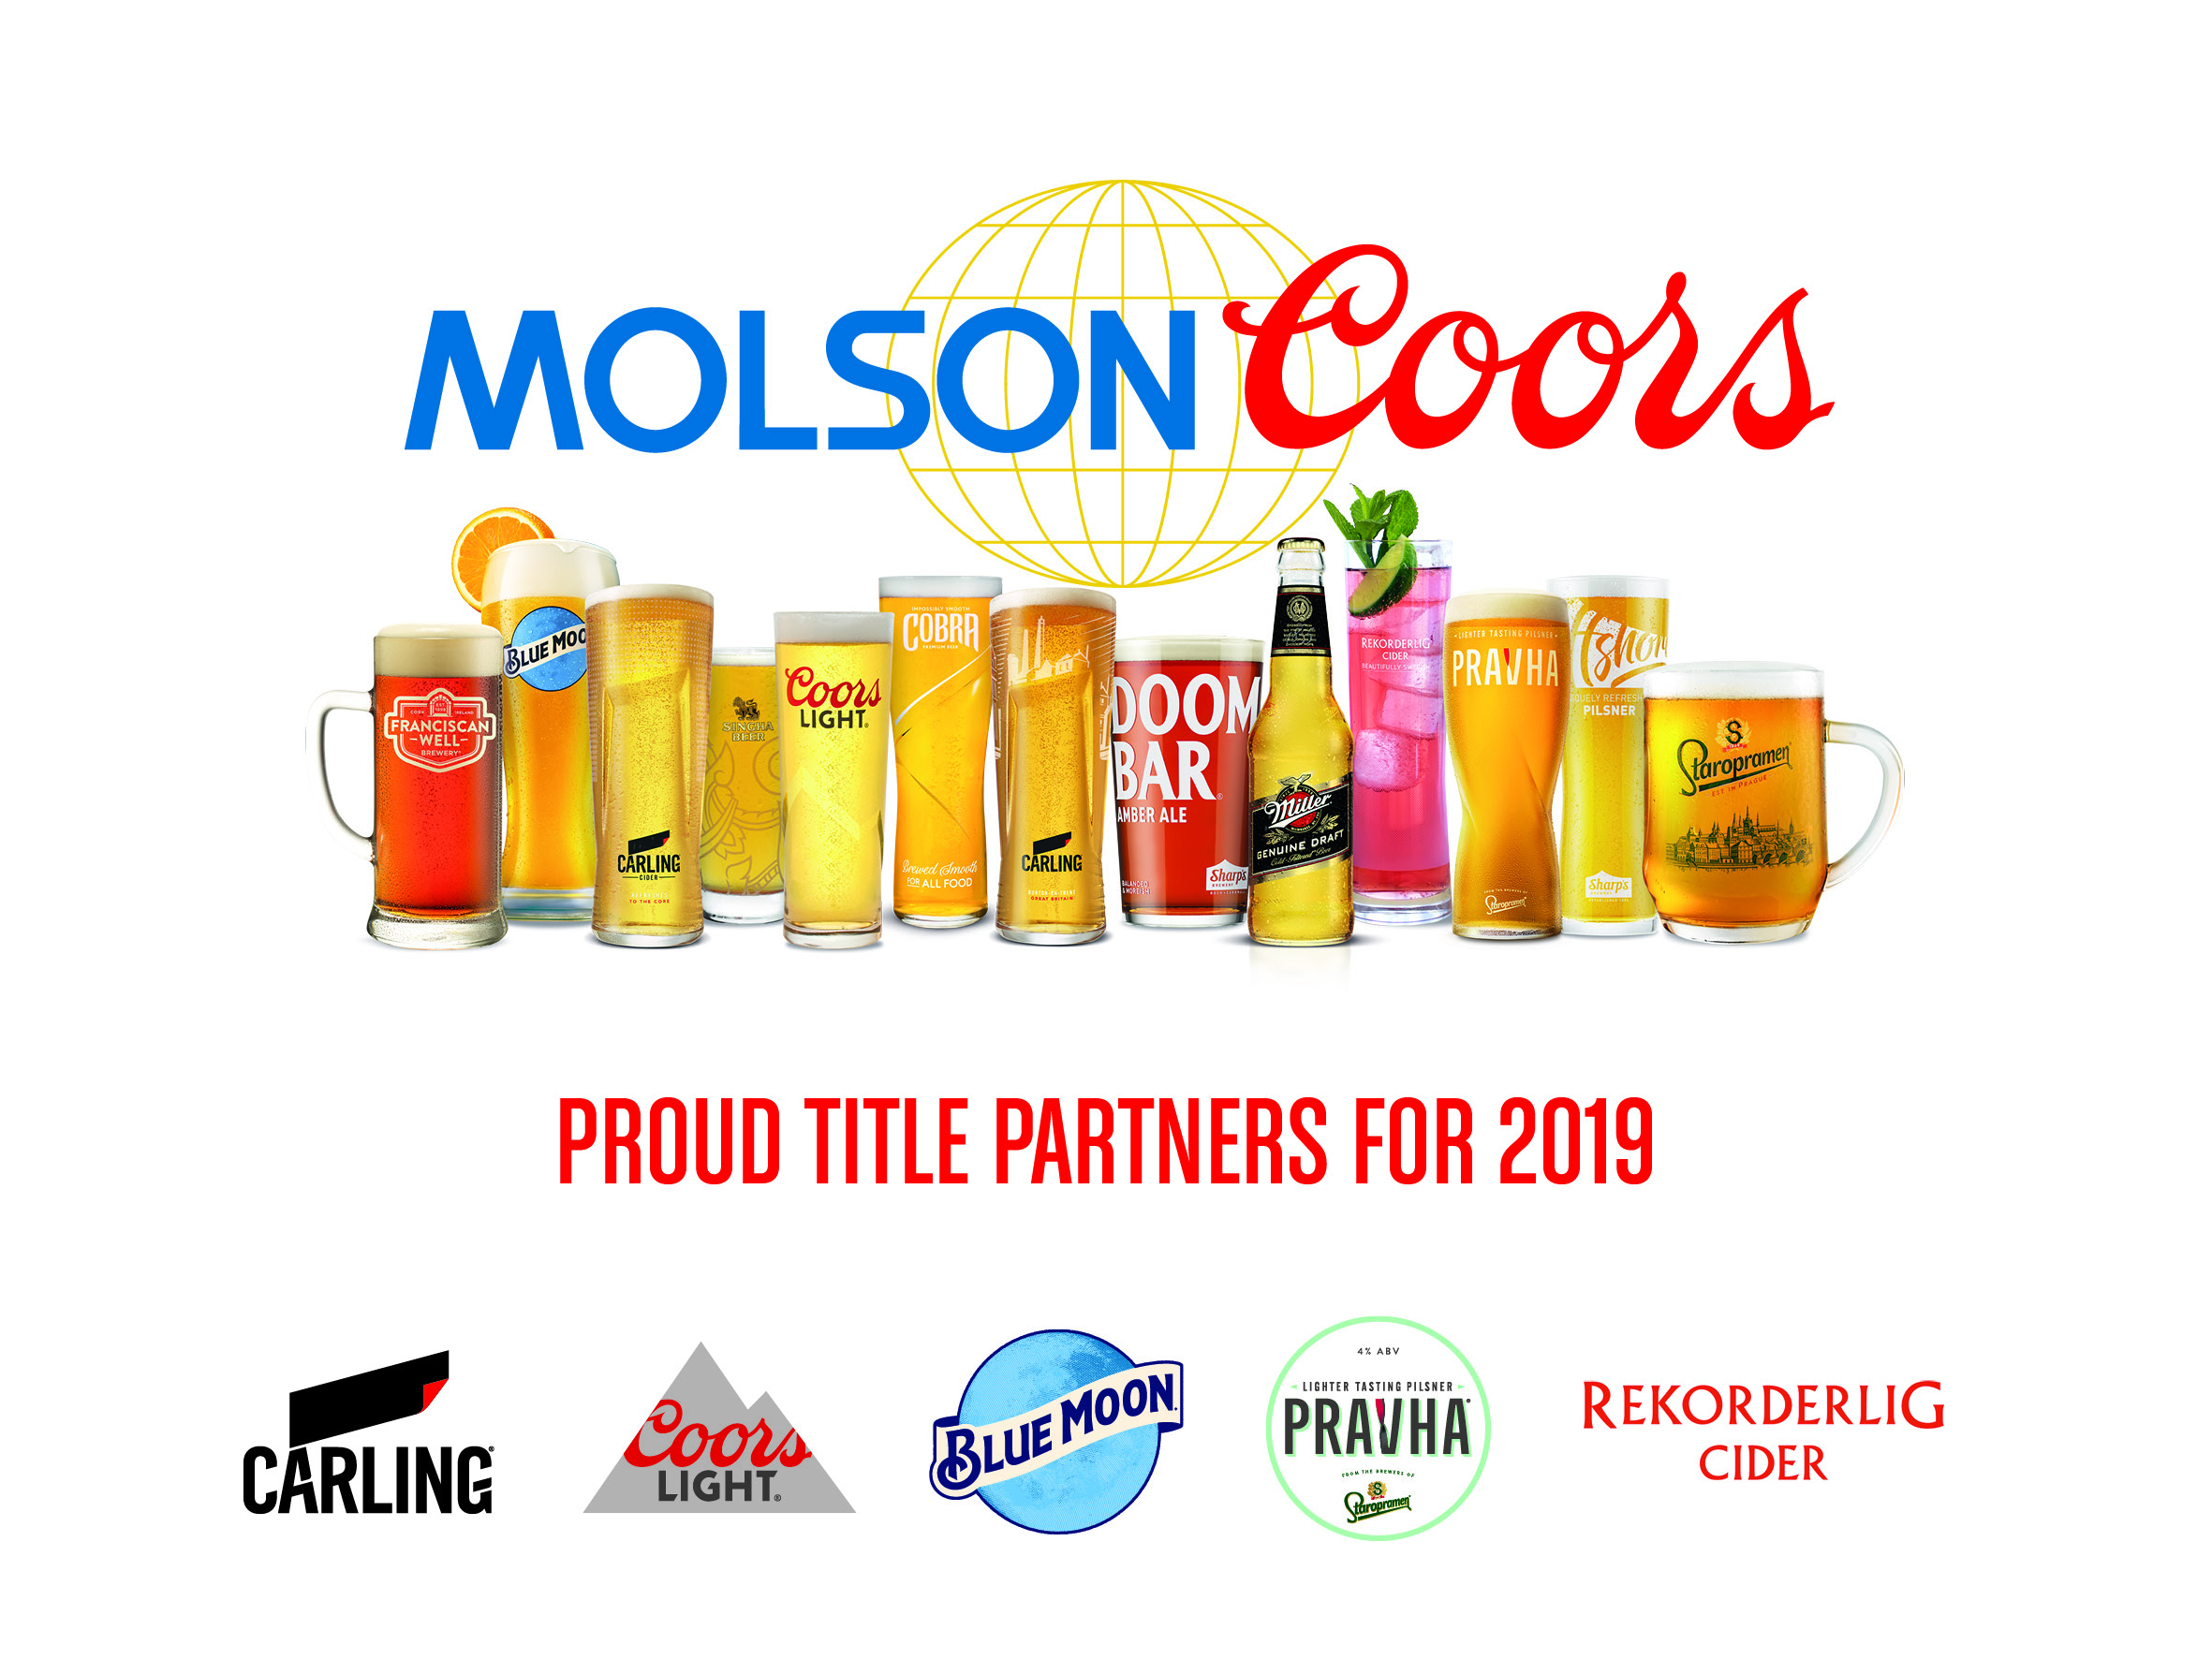 Molson Coors Proud Title Partners